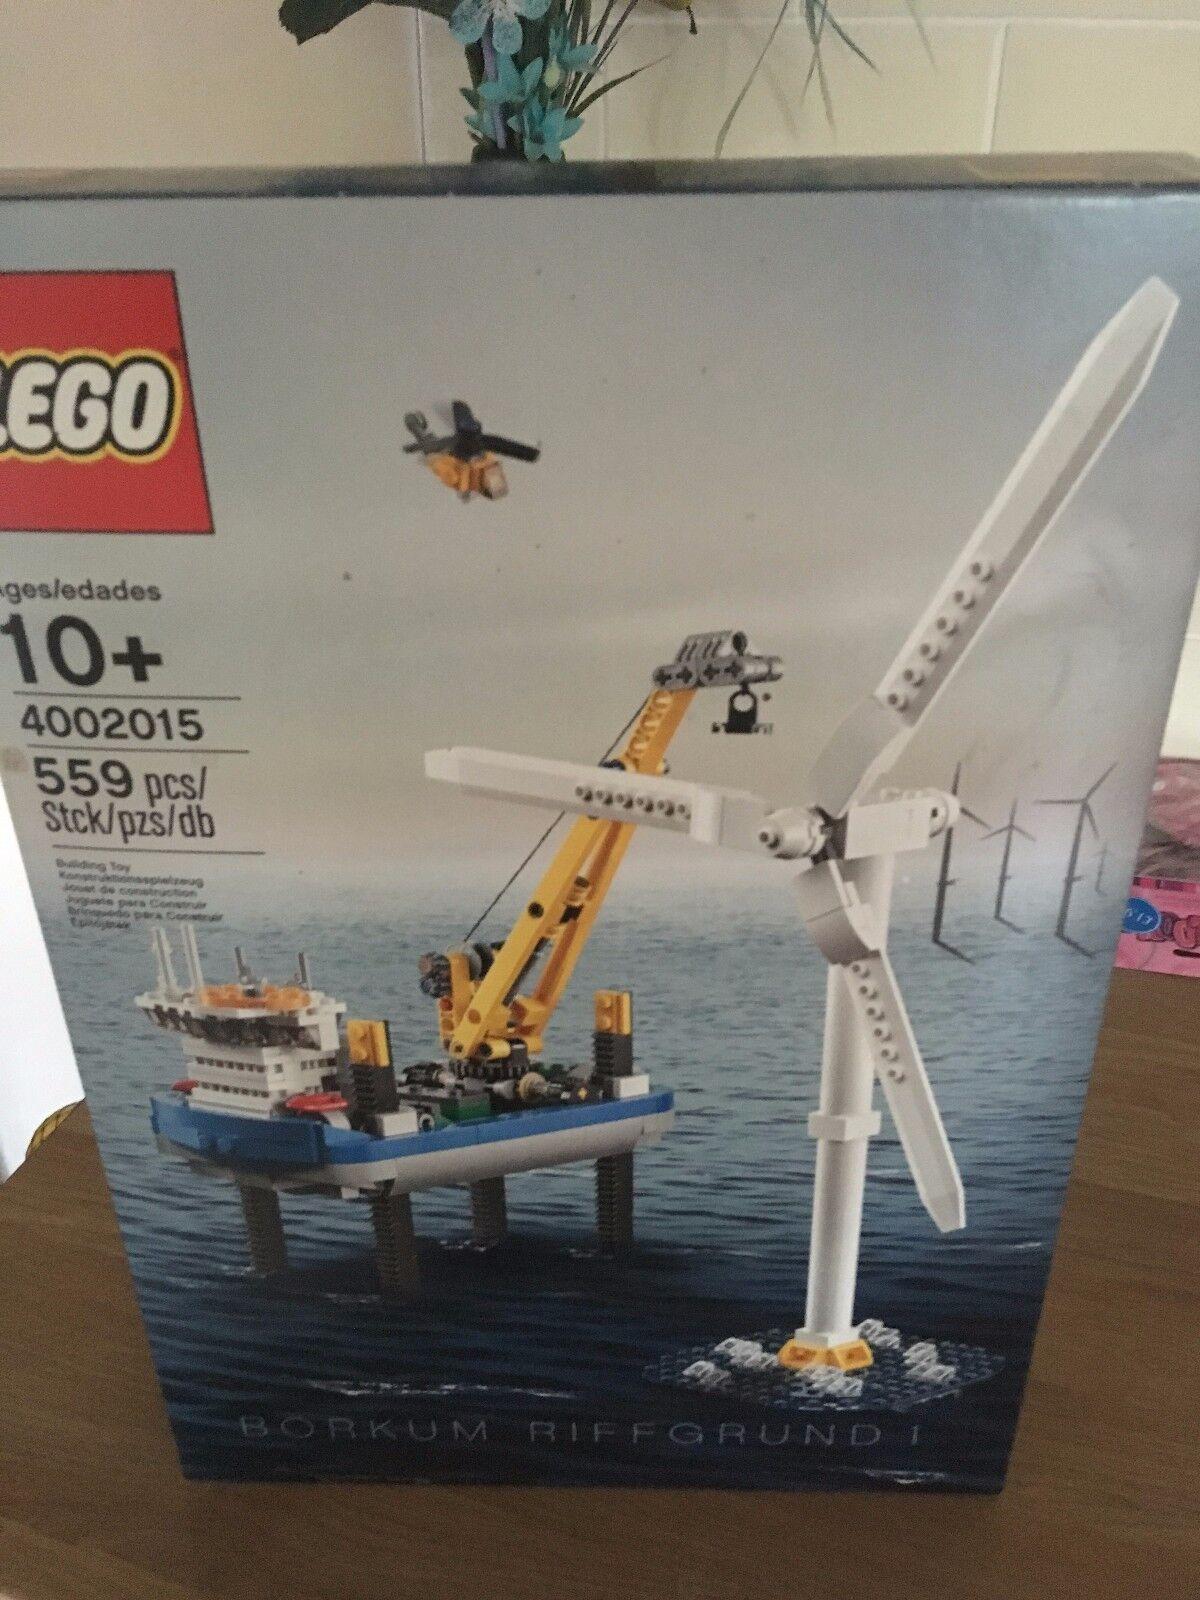 LEGO 4002015  Borkum Borkum Borkum Riffgrund NEW SEALED 194263